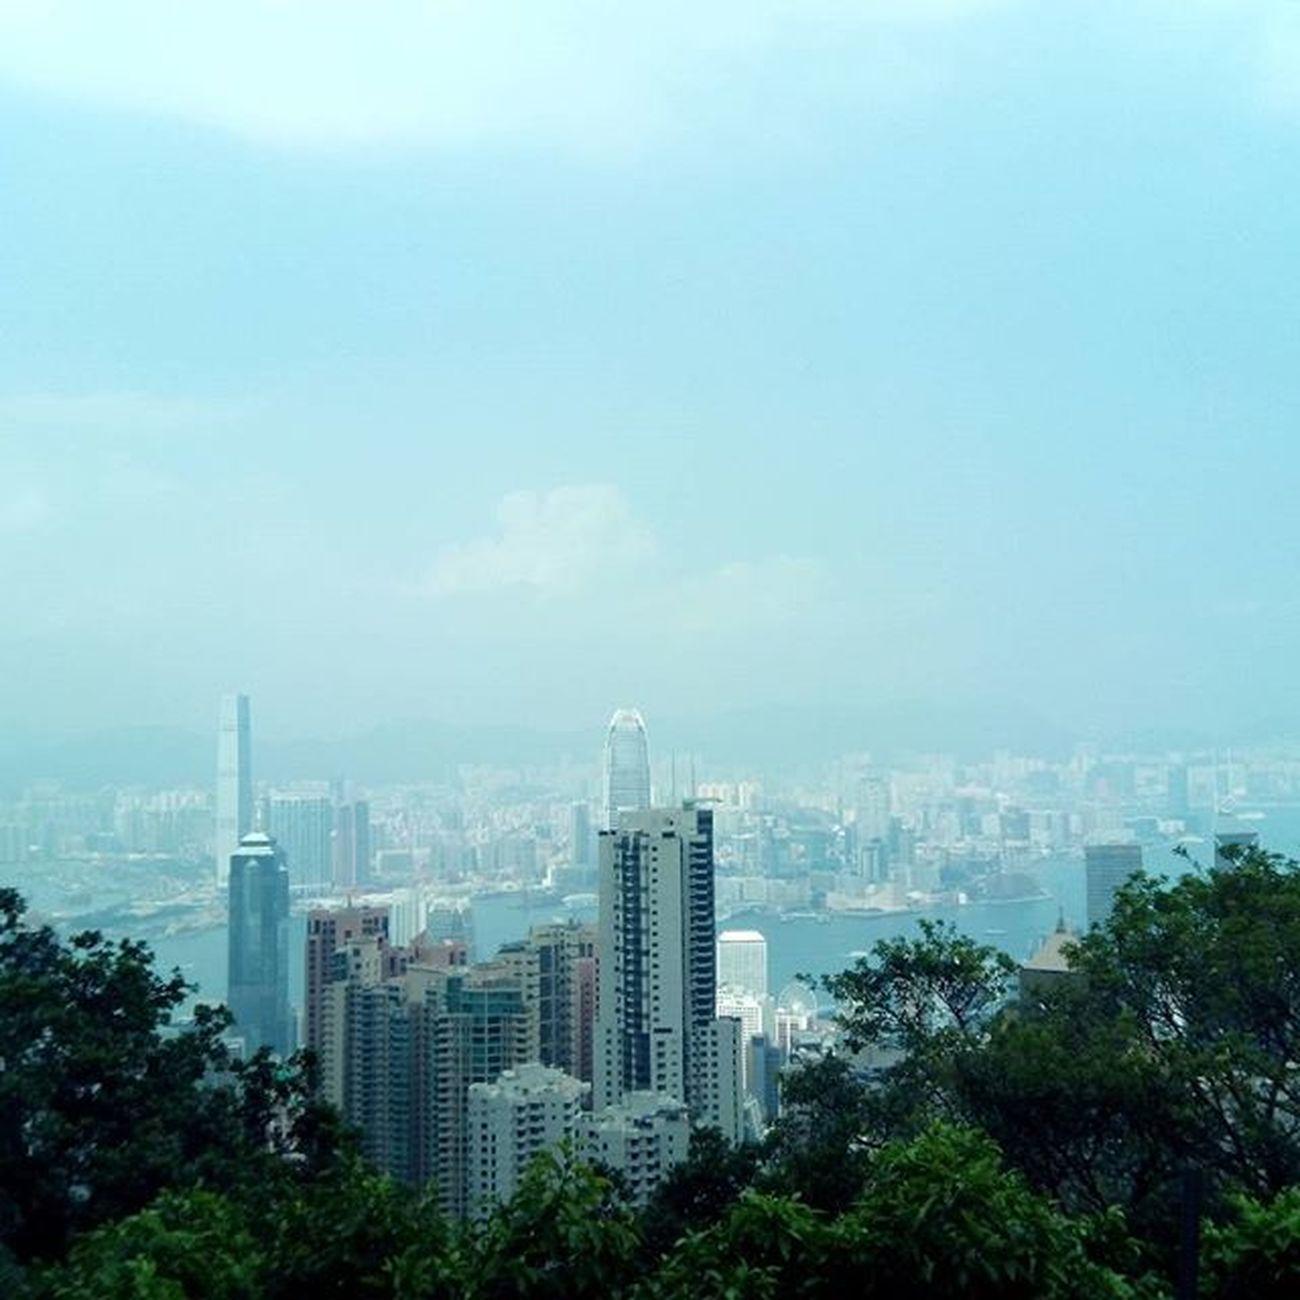 Victoria peak VictoriaPeak HongKong Traveling Mbambungnekat treqx1 treqcapture @treqandroid